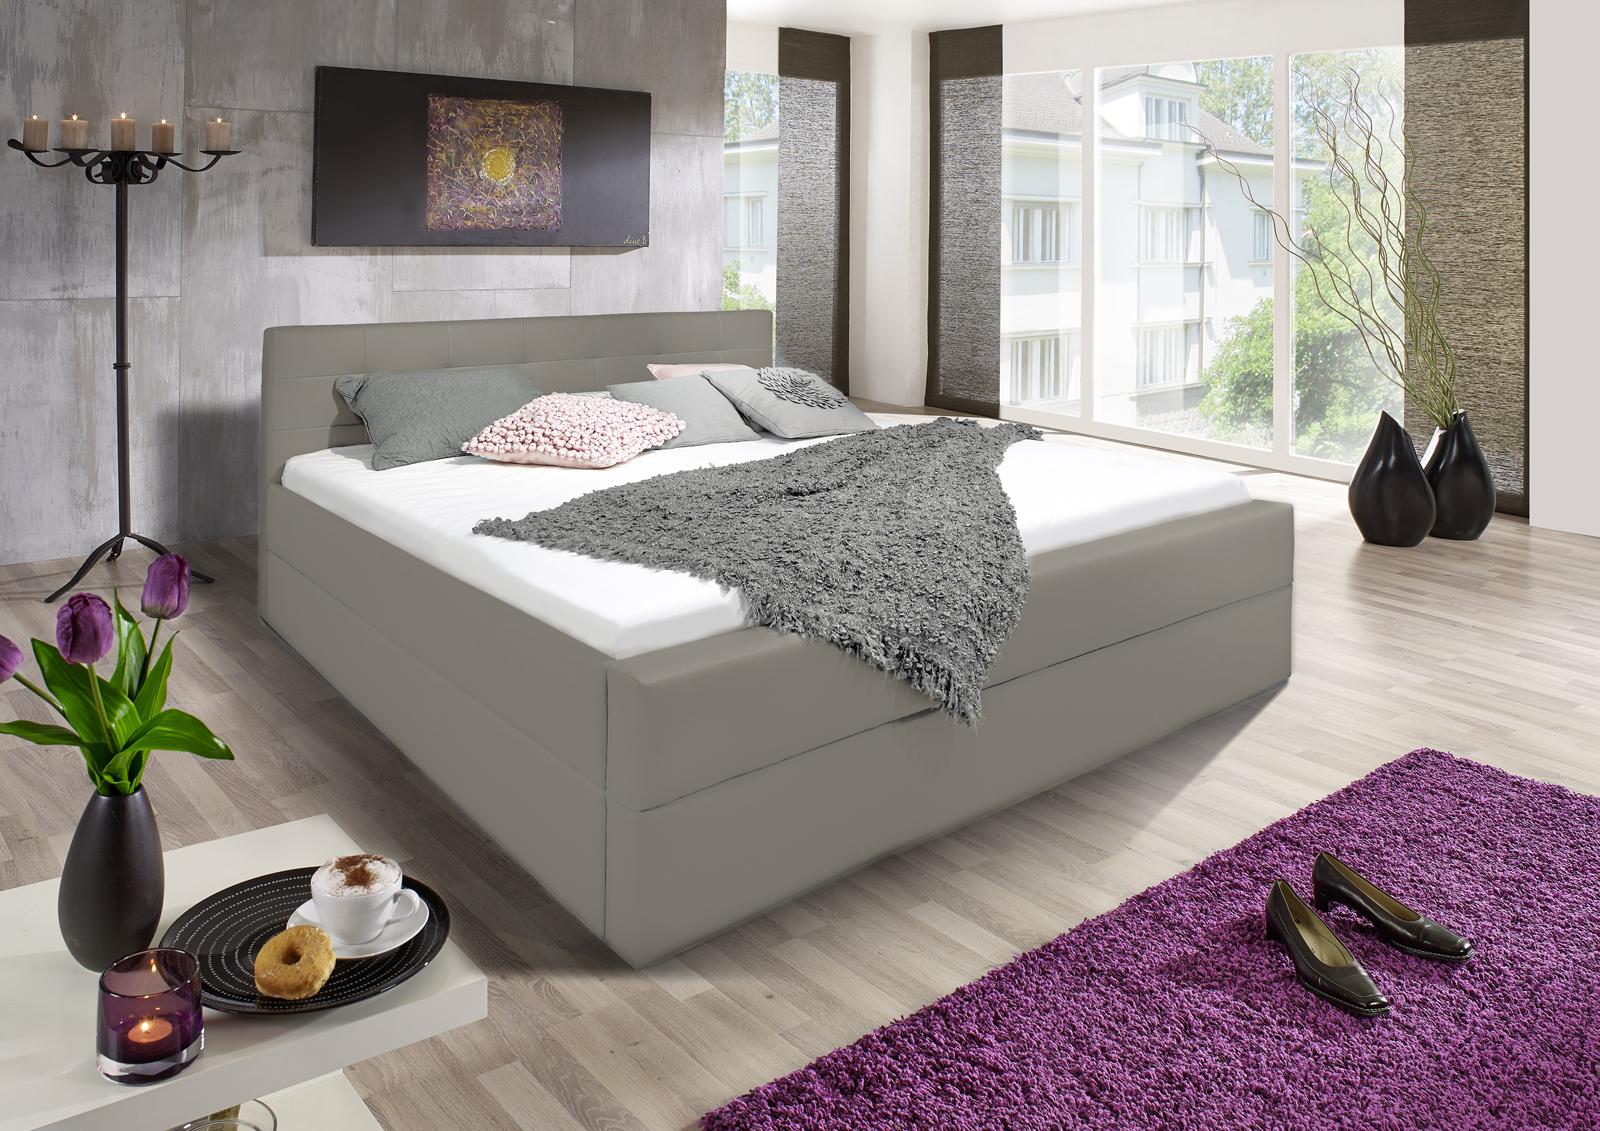 sam design boxspringbett 140 x 200 cm muddy kappa. Black Bedroom Furniture Sets. Home Design Ideas